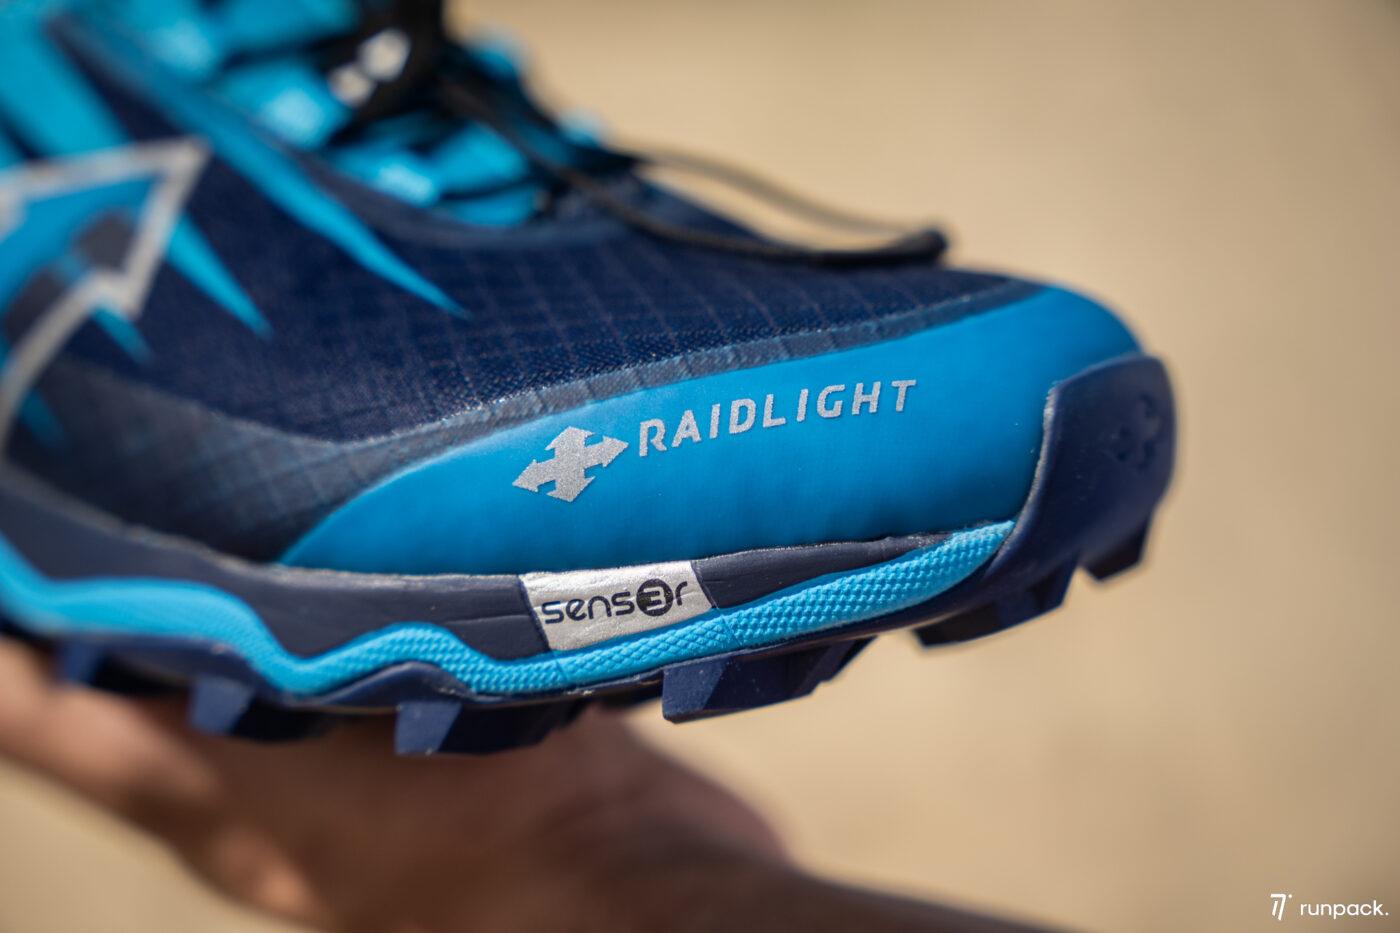 Chaussures Revolutiv Protect Raidlight